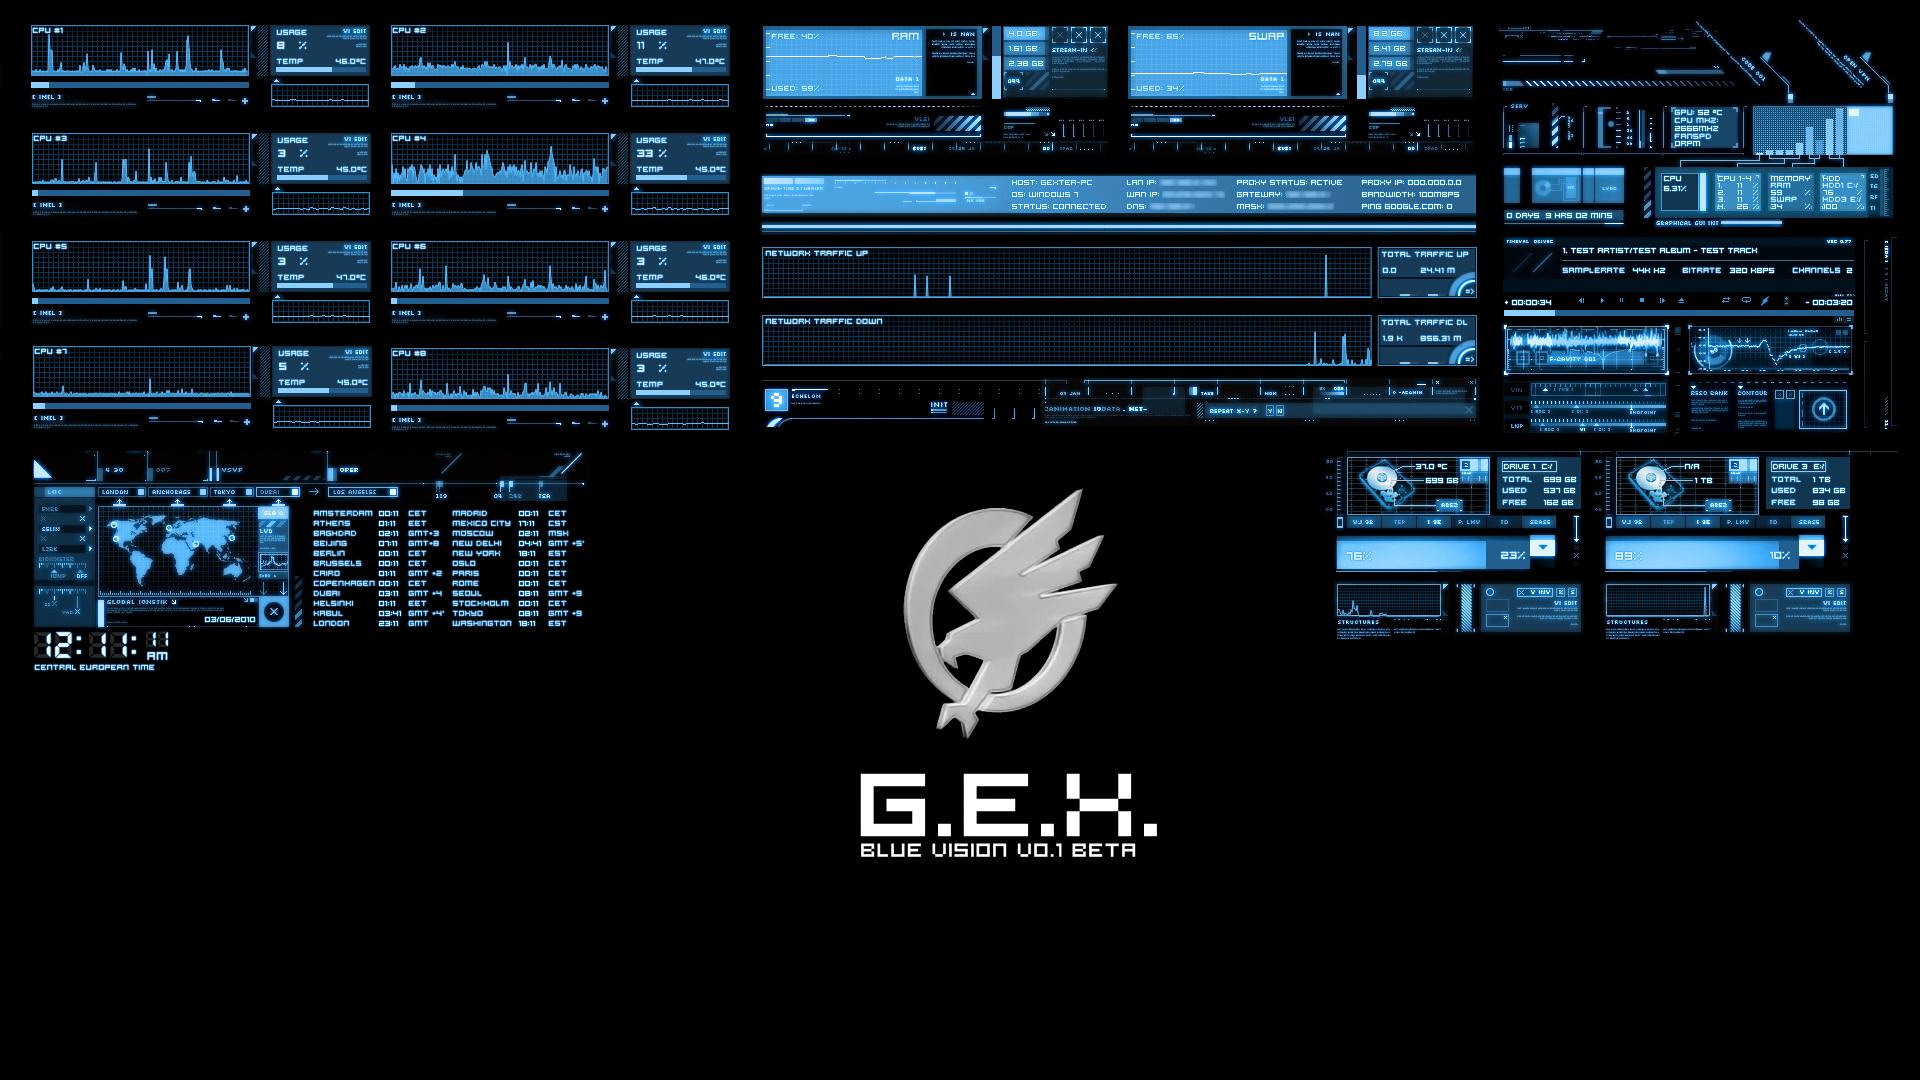 BlueVision V0.1 Beta